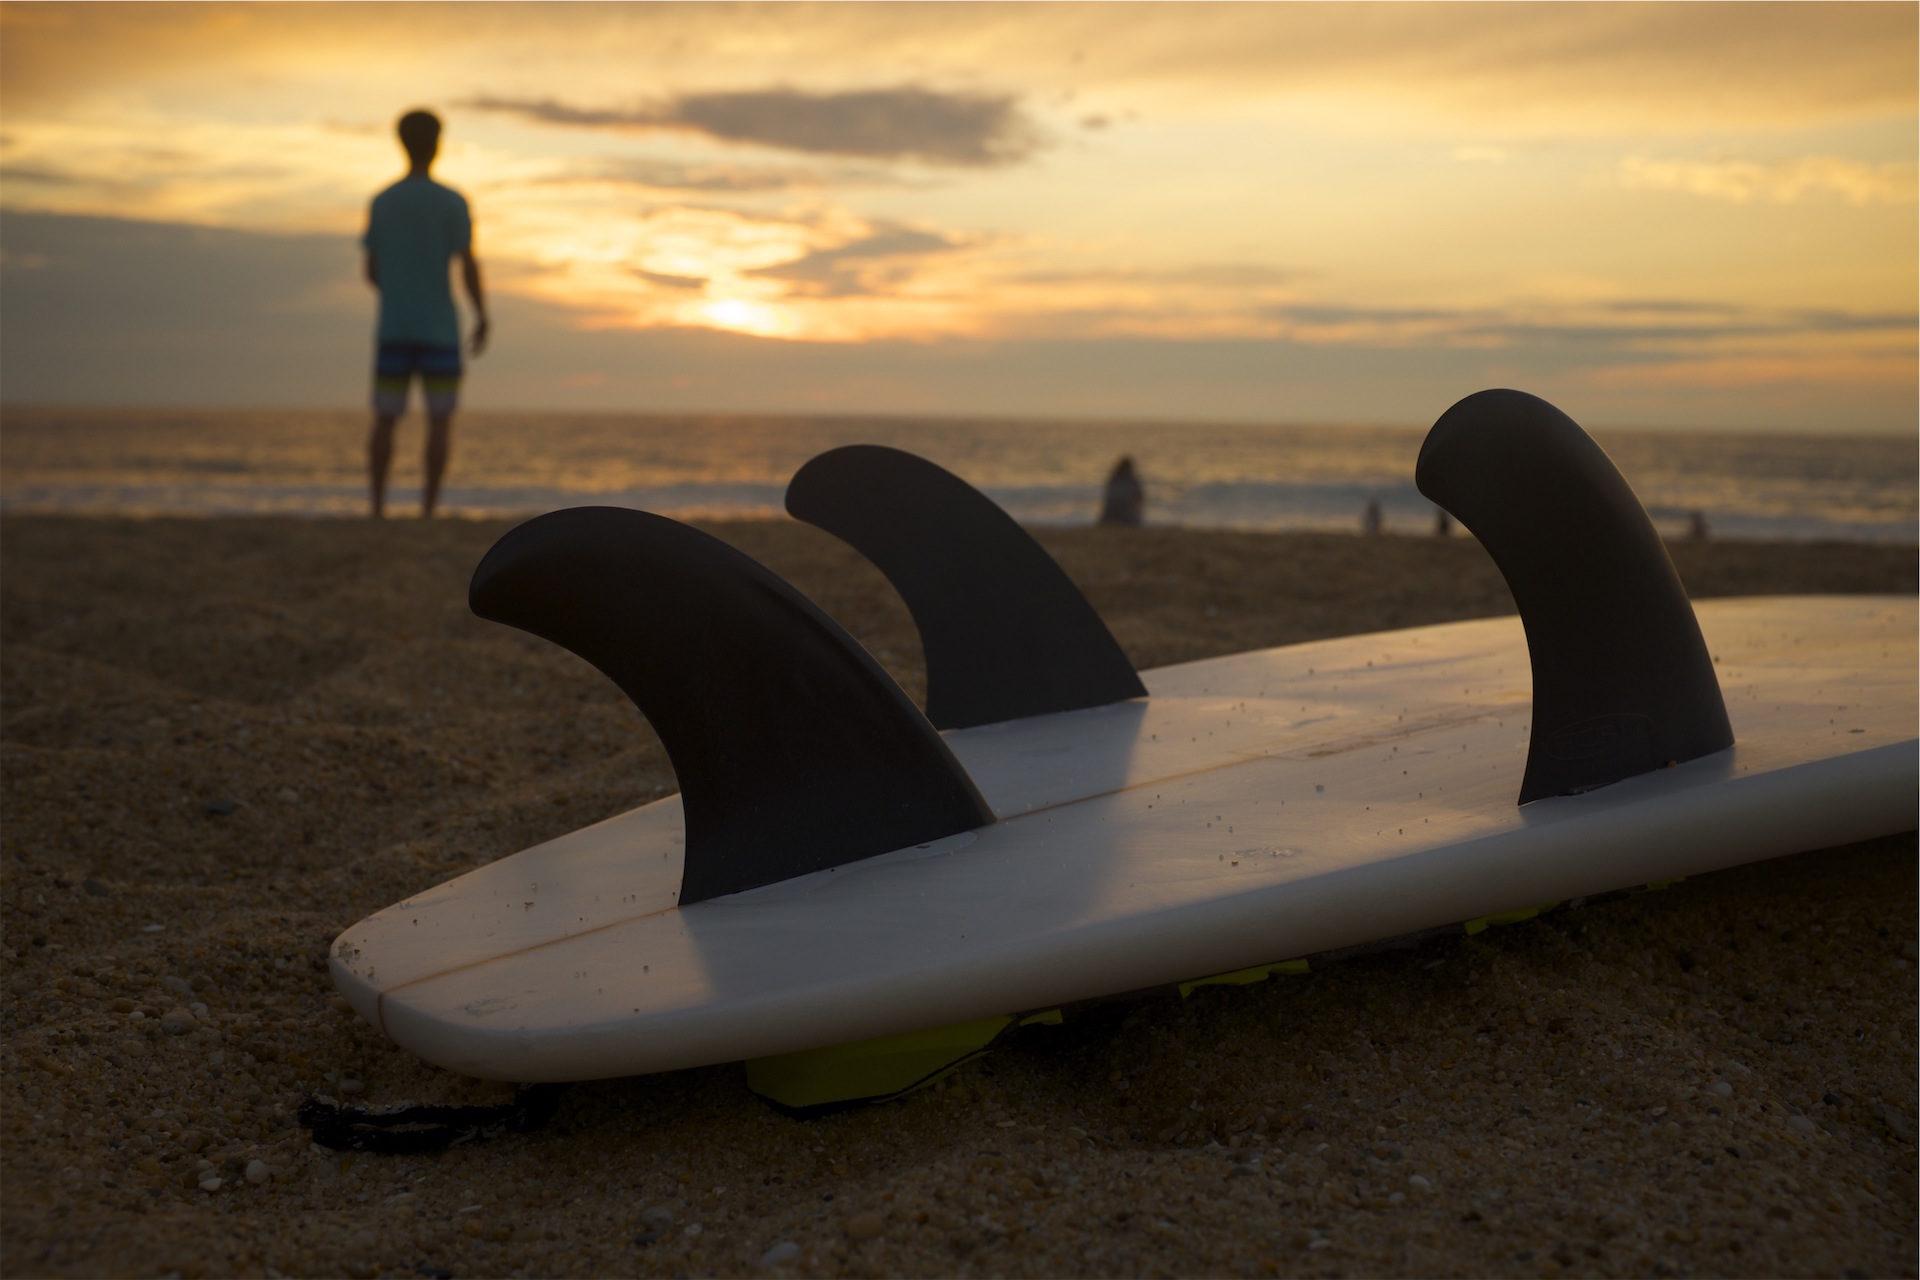 Surf, Strand, Tabelle, Sand, Risiko - Wallpaper HD - Prof.-falken.com